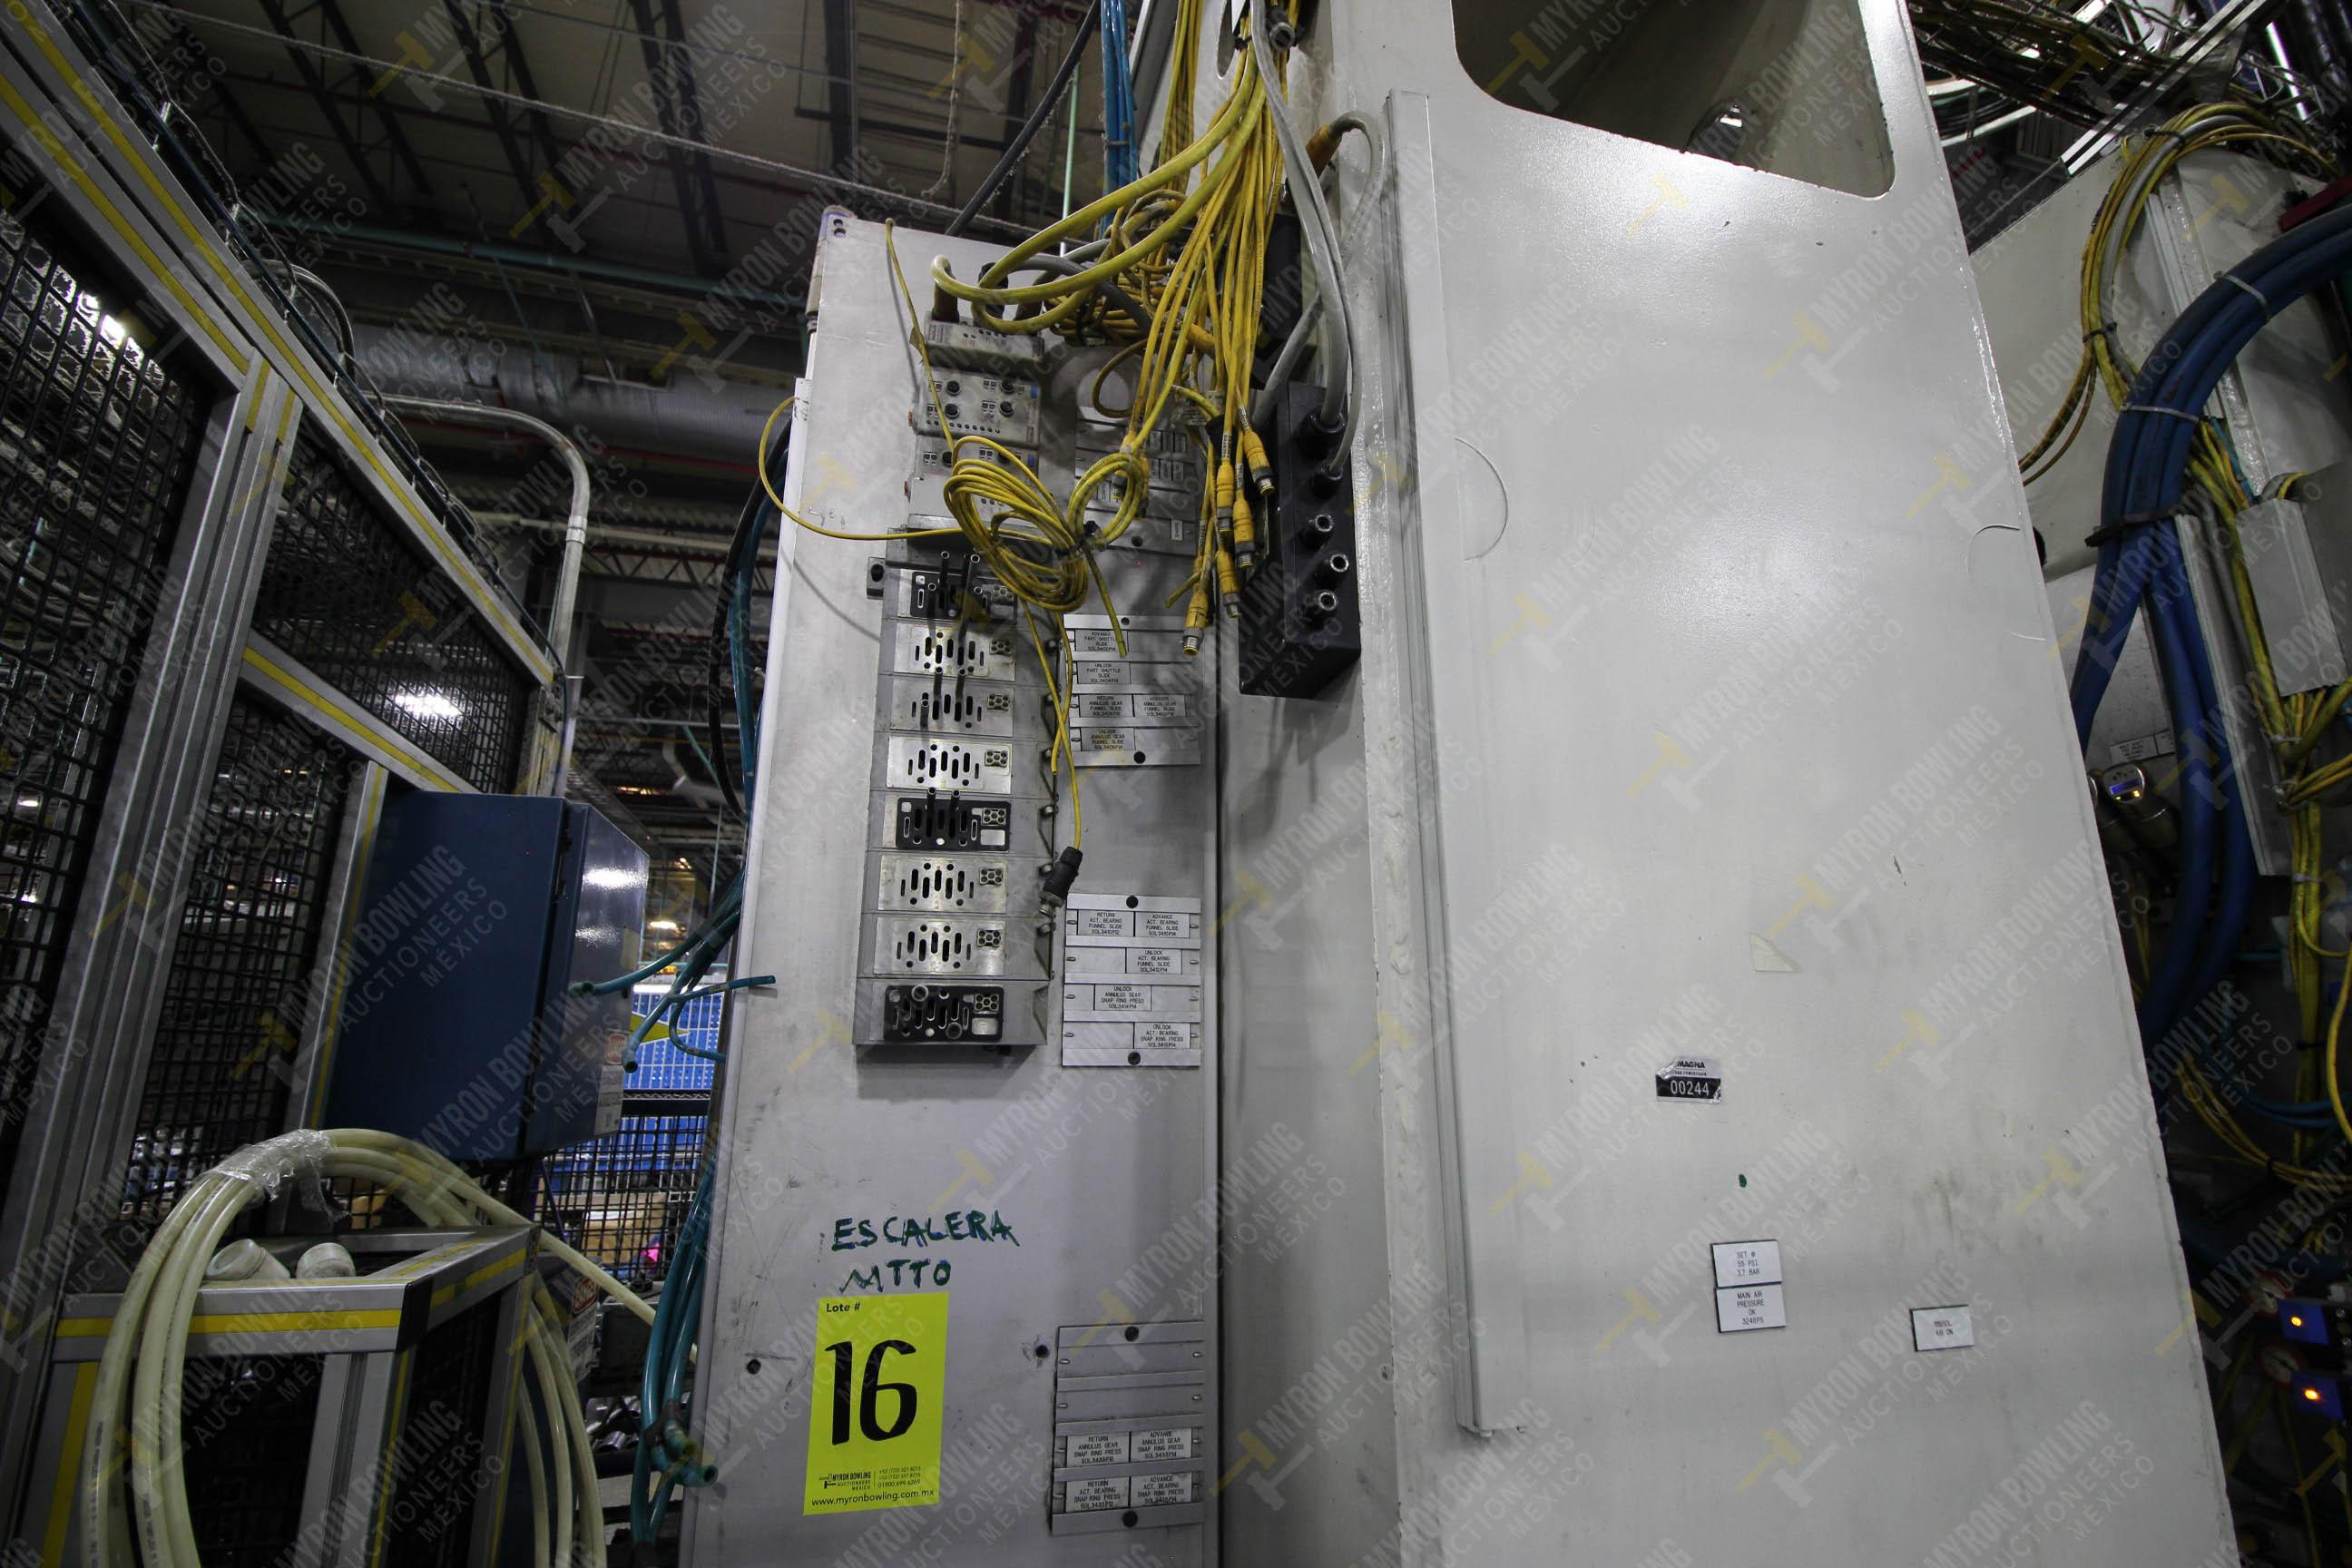 Estación semiautomática para operación 305D, contiene: Prensa tipo cuello de ganso con dos cilindros - Image 10 of 20